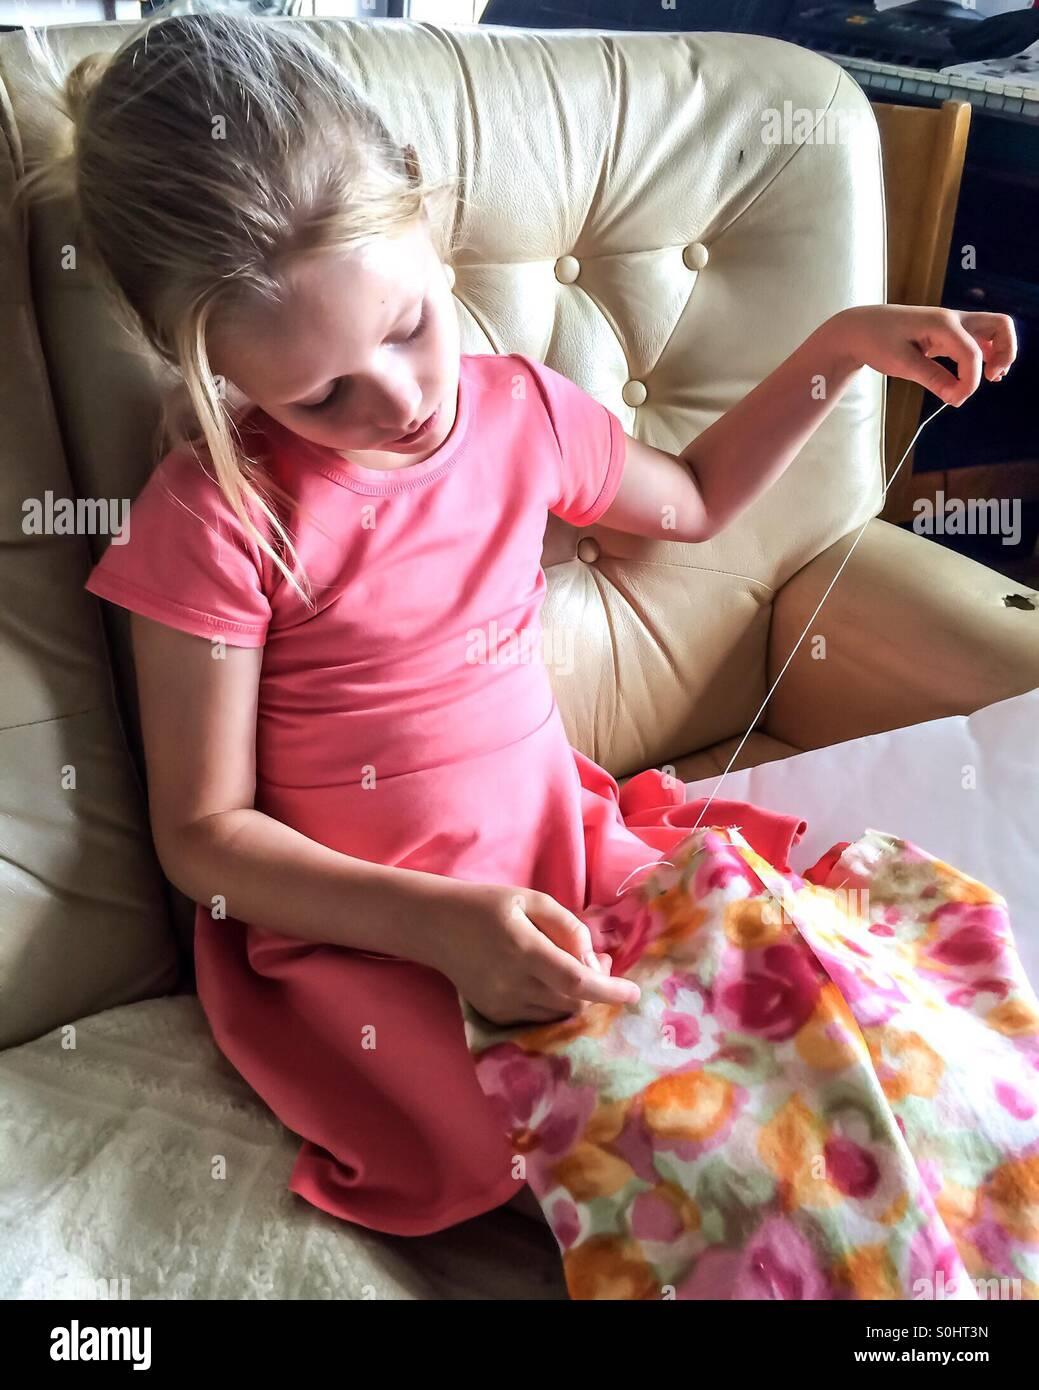 Mädchen näht einen Kissenbezug von hand Stockbild